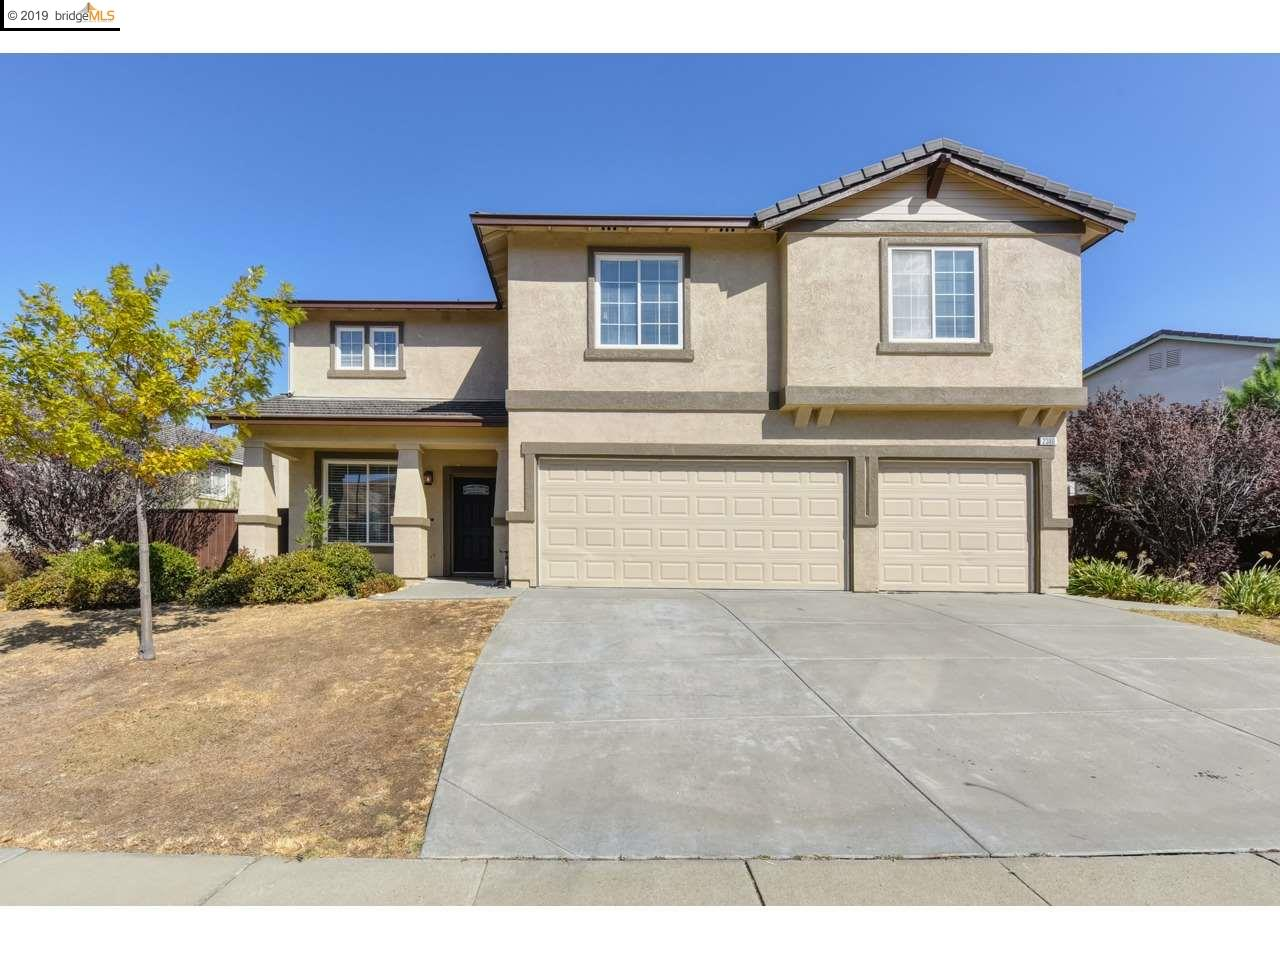 2380 Woodhill Dr, PITTSBURG, CA 94565